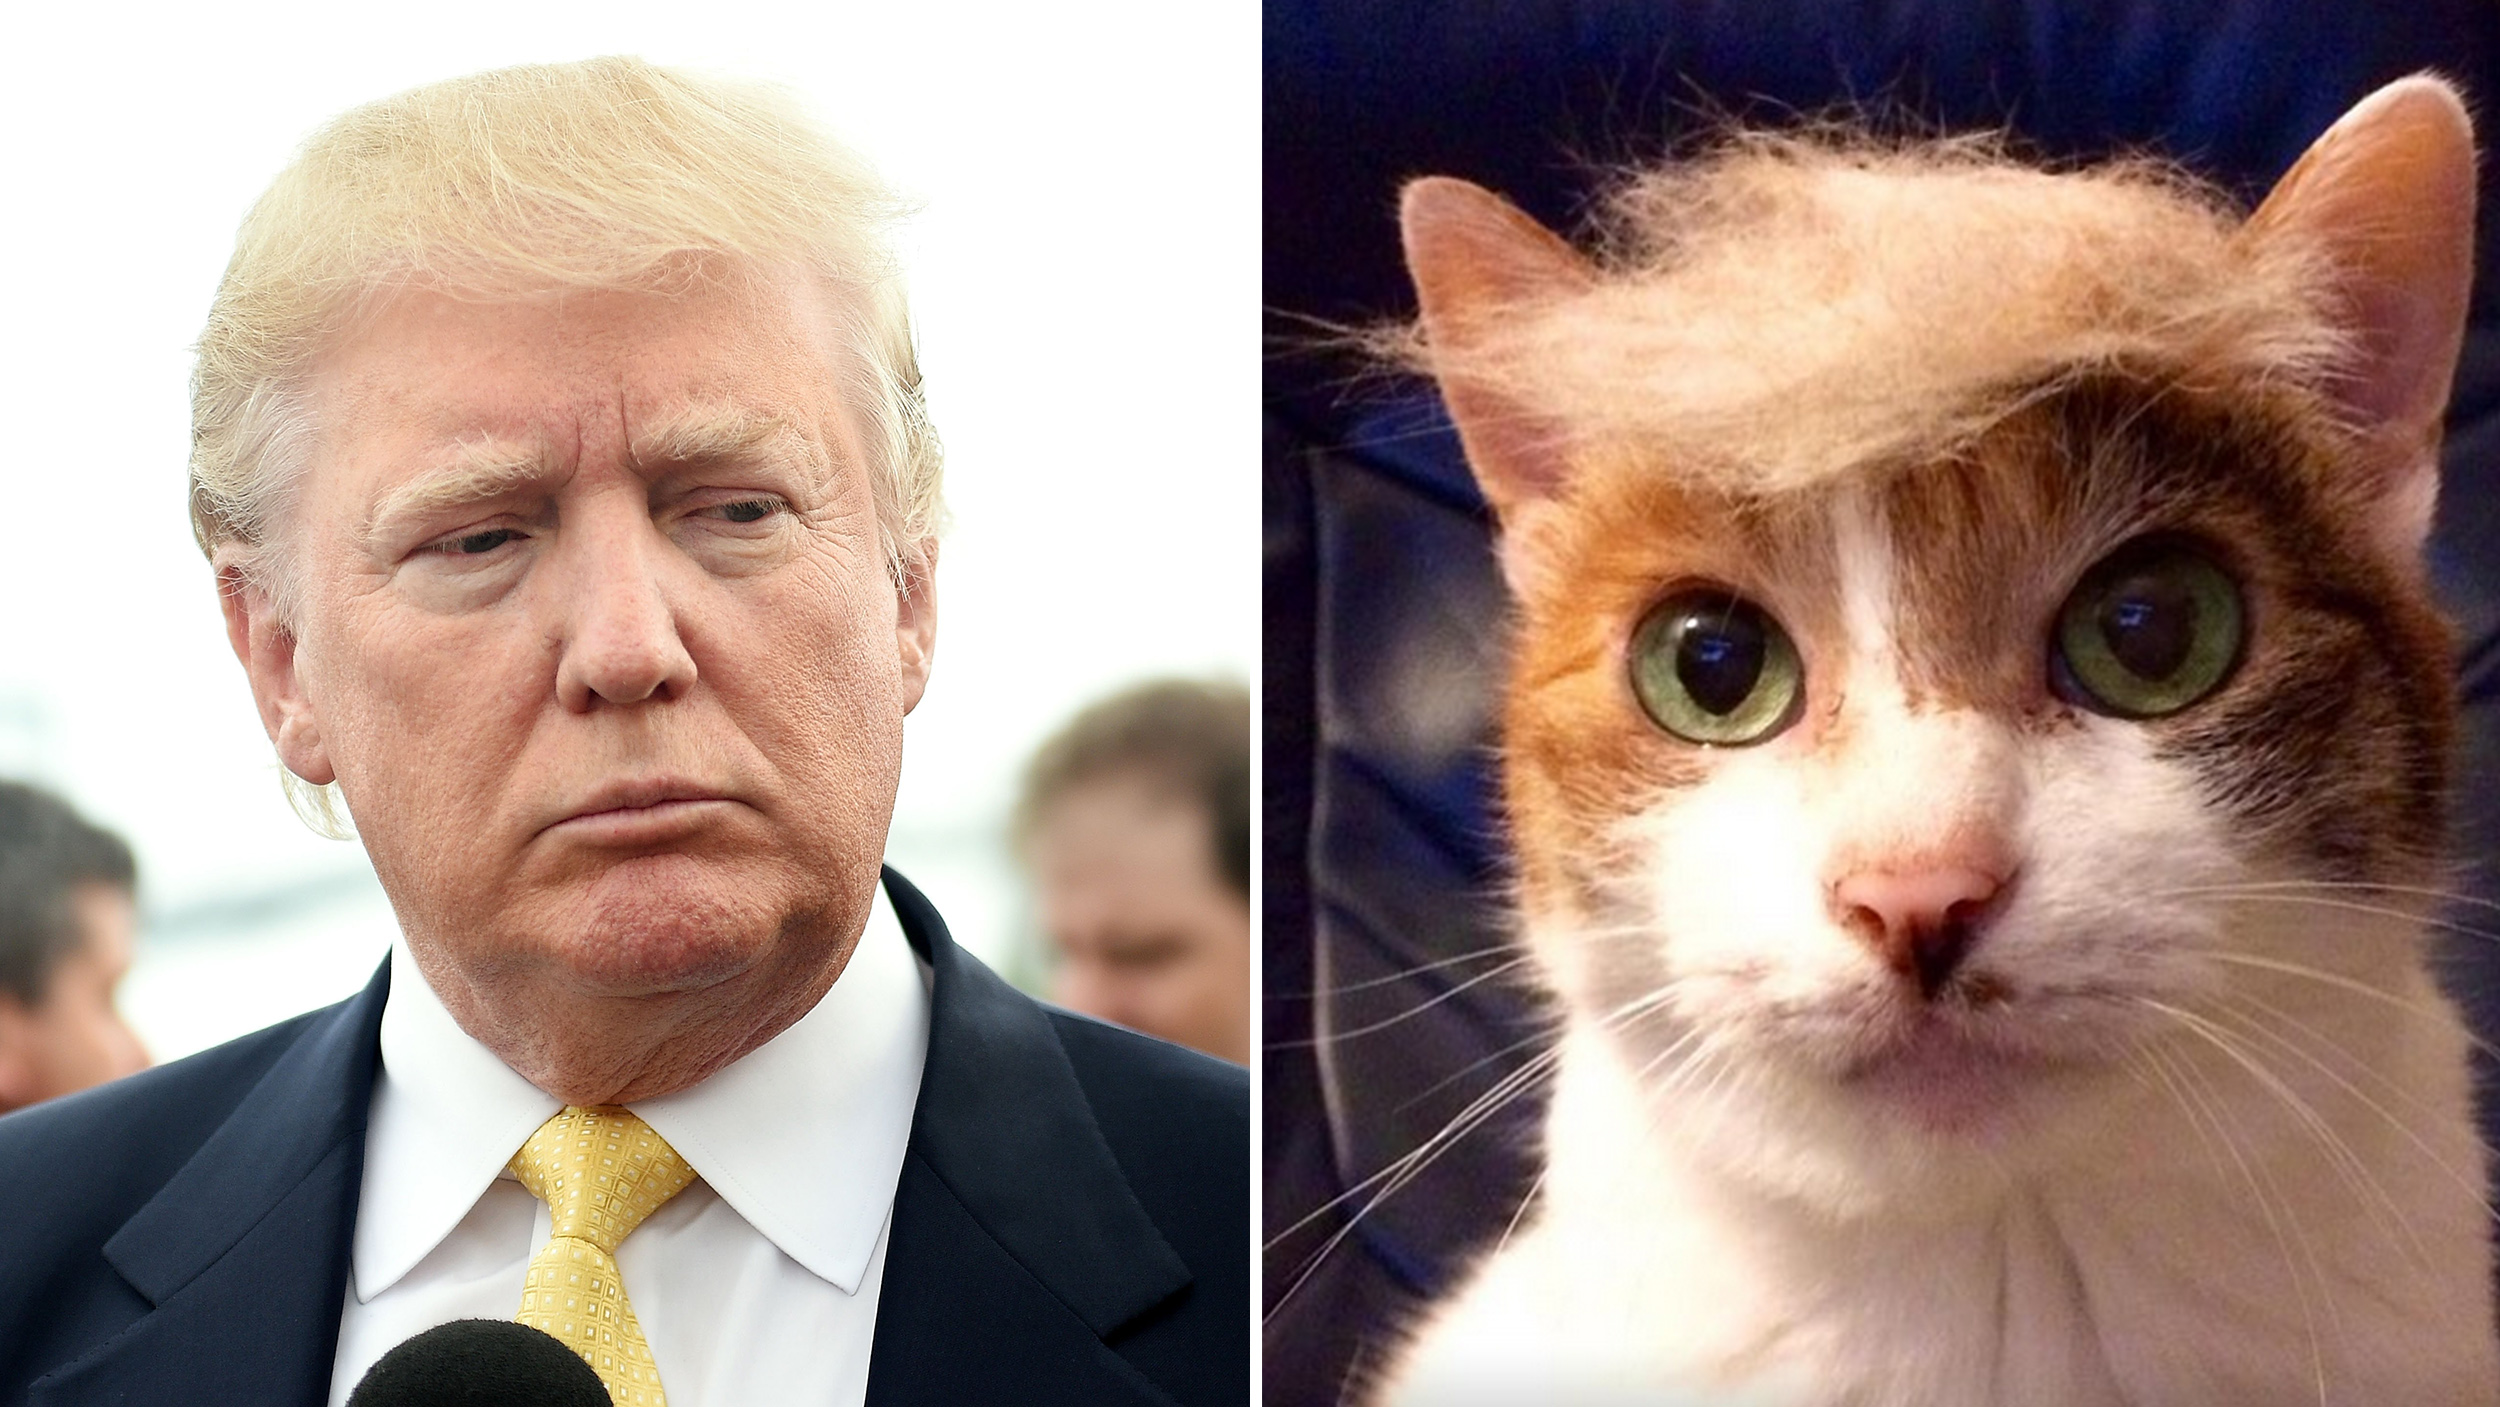 Trumpyourcat Reveals Cats With Donald Trump Hair